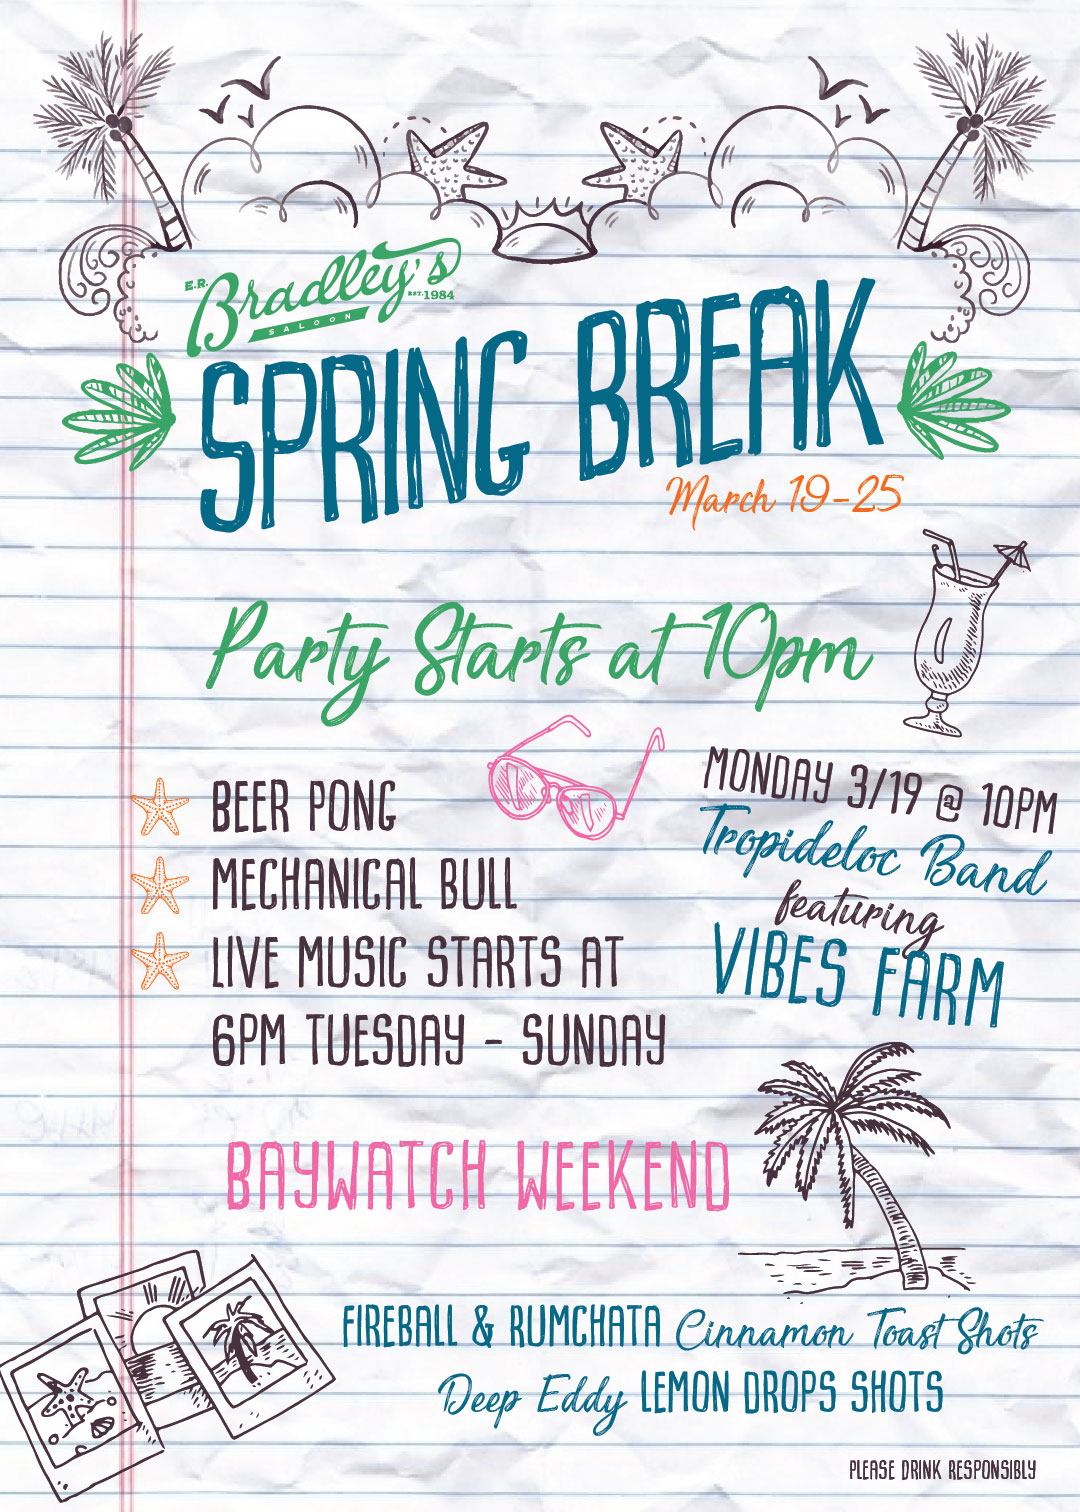 graphic design spring break party fyler for er bradleys by nicole david